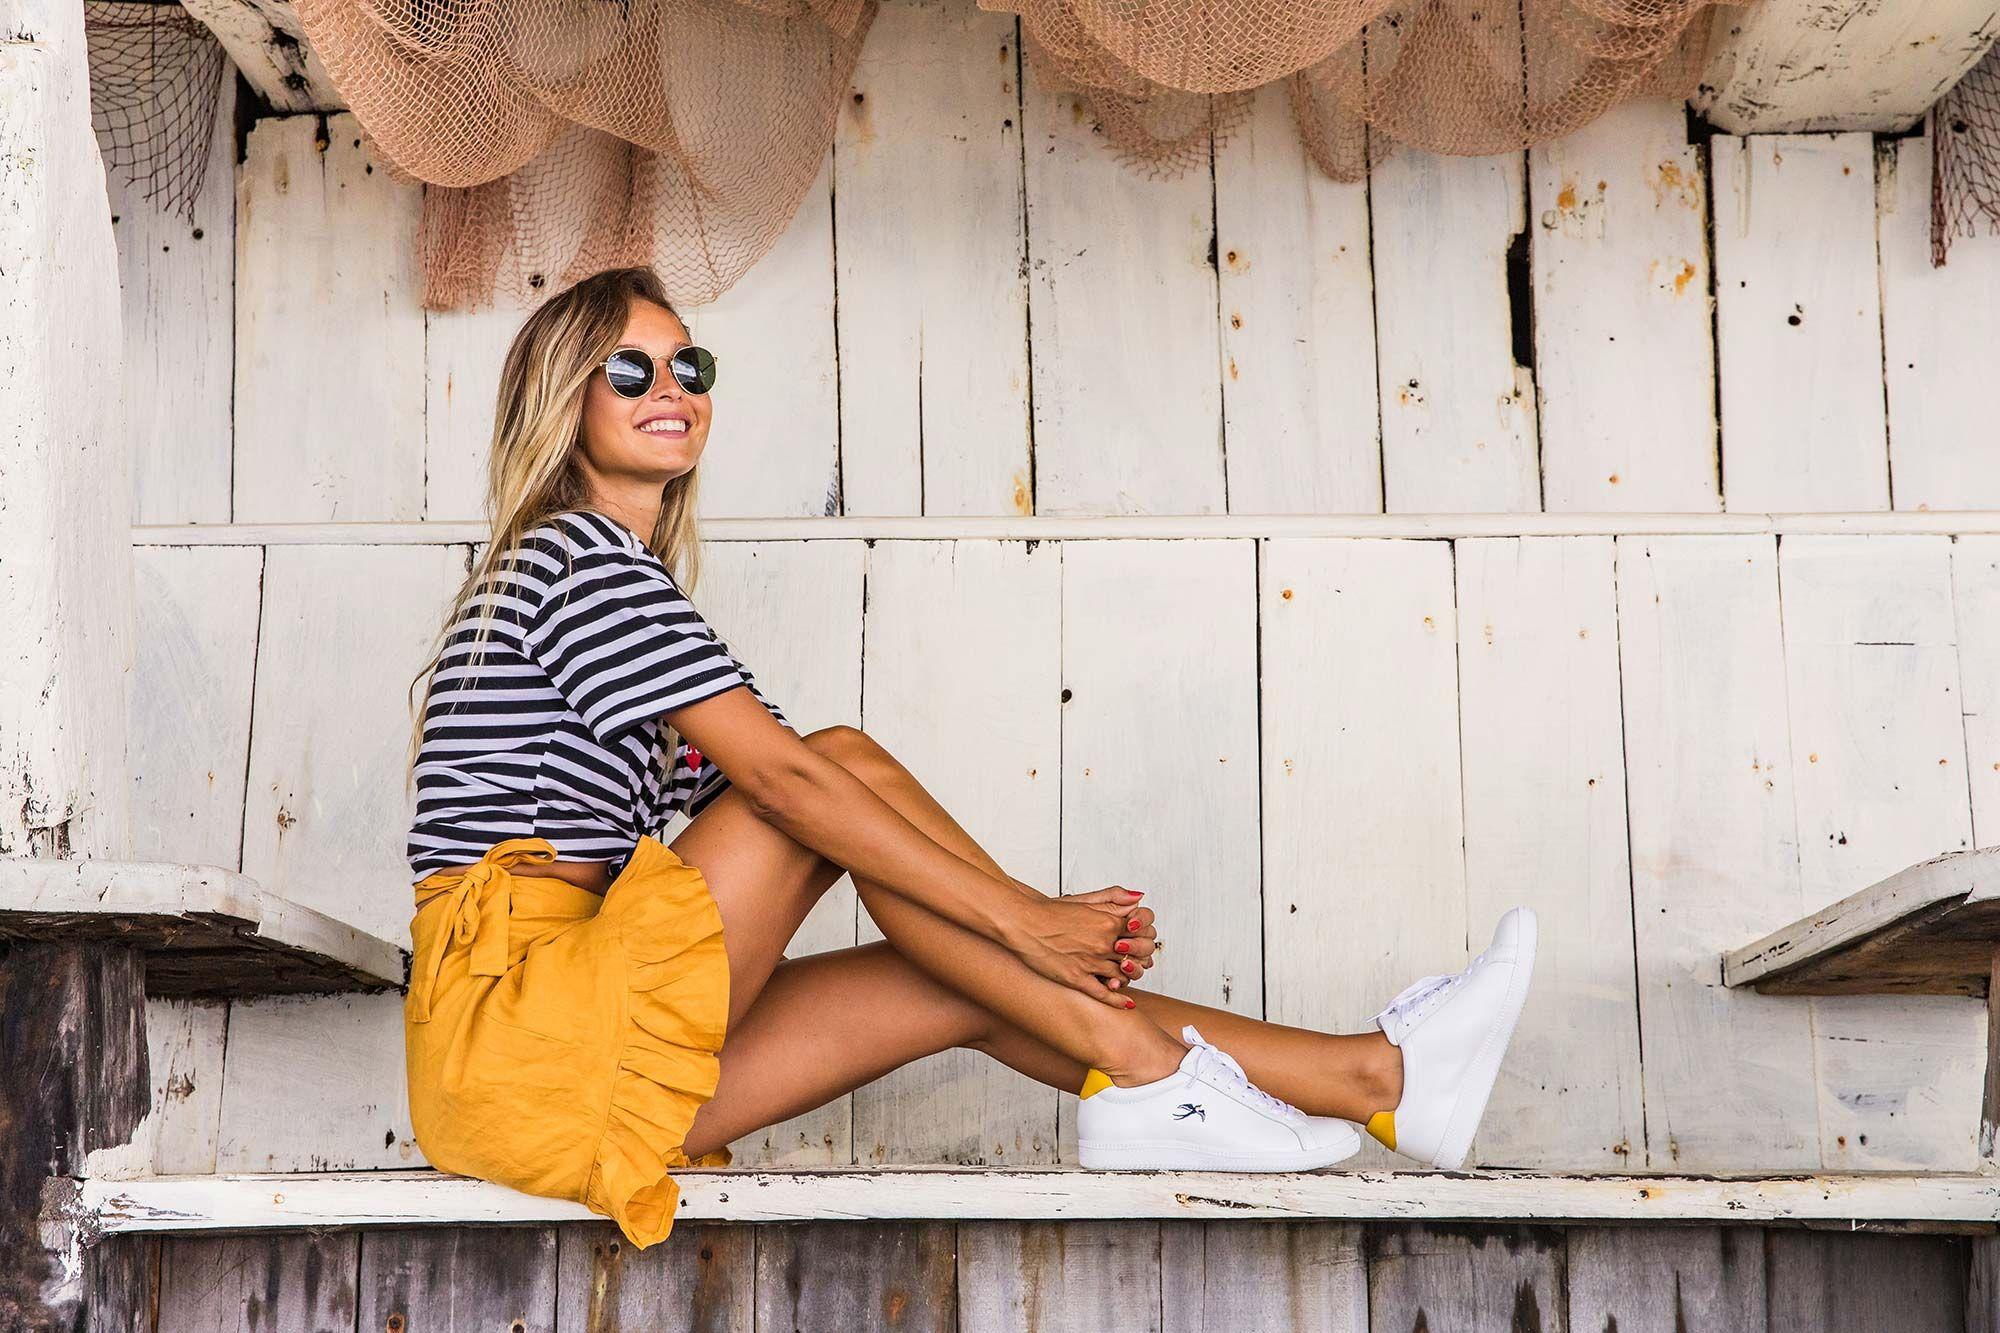 Bared_Footwear_La_Brisa_Bali_Travel_Summer_Womens_Campaign_Sandpiper_White_Yellow_Sneakers_Yellow_Skirt